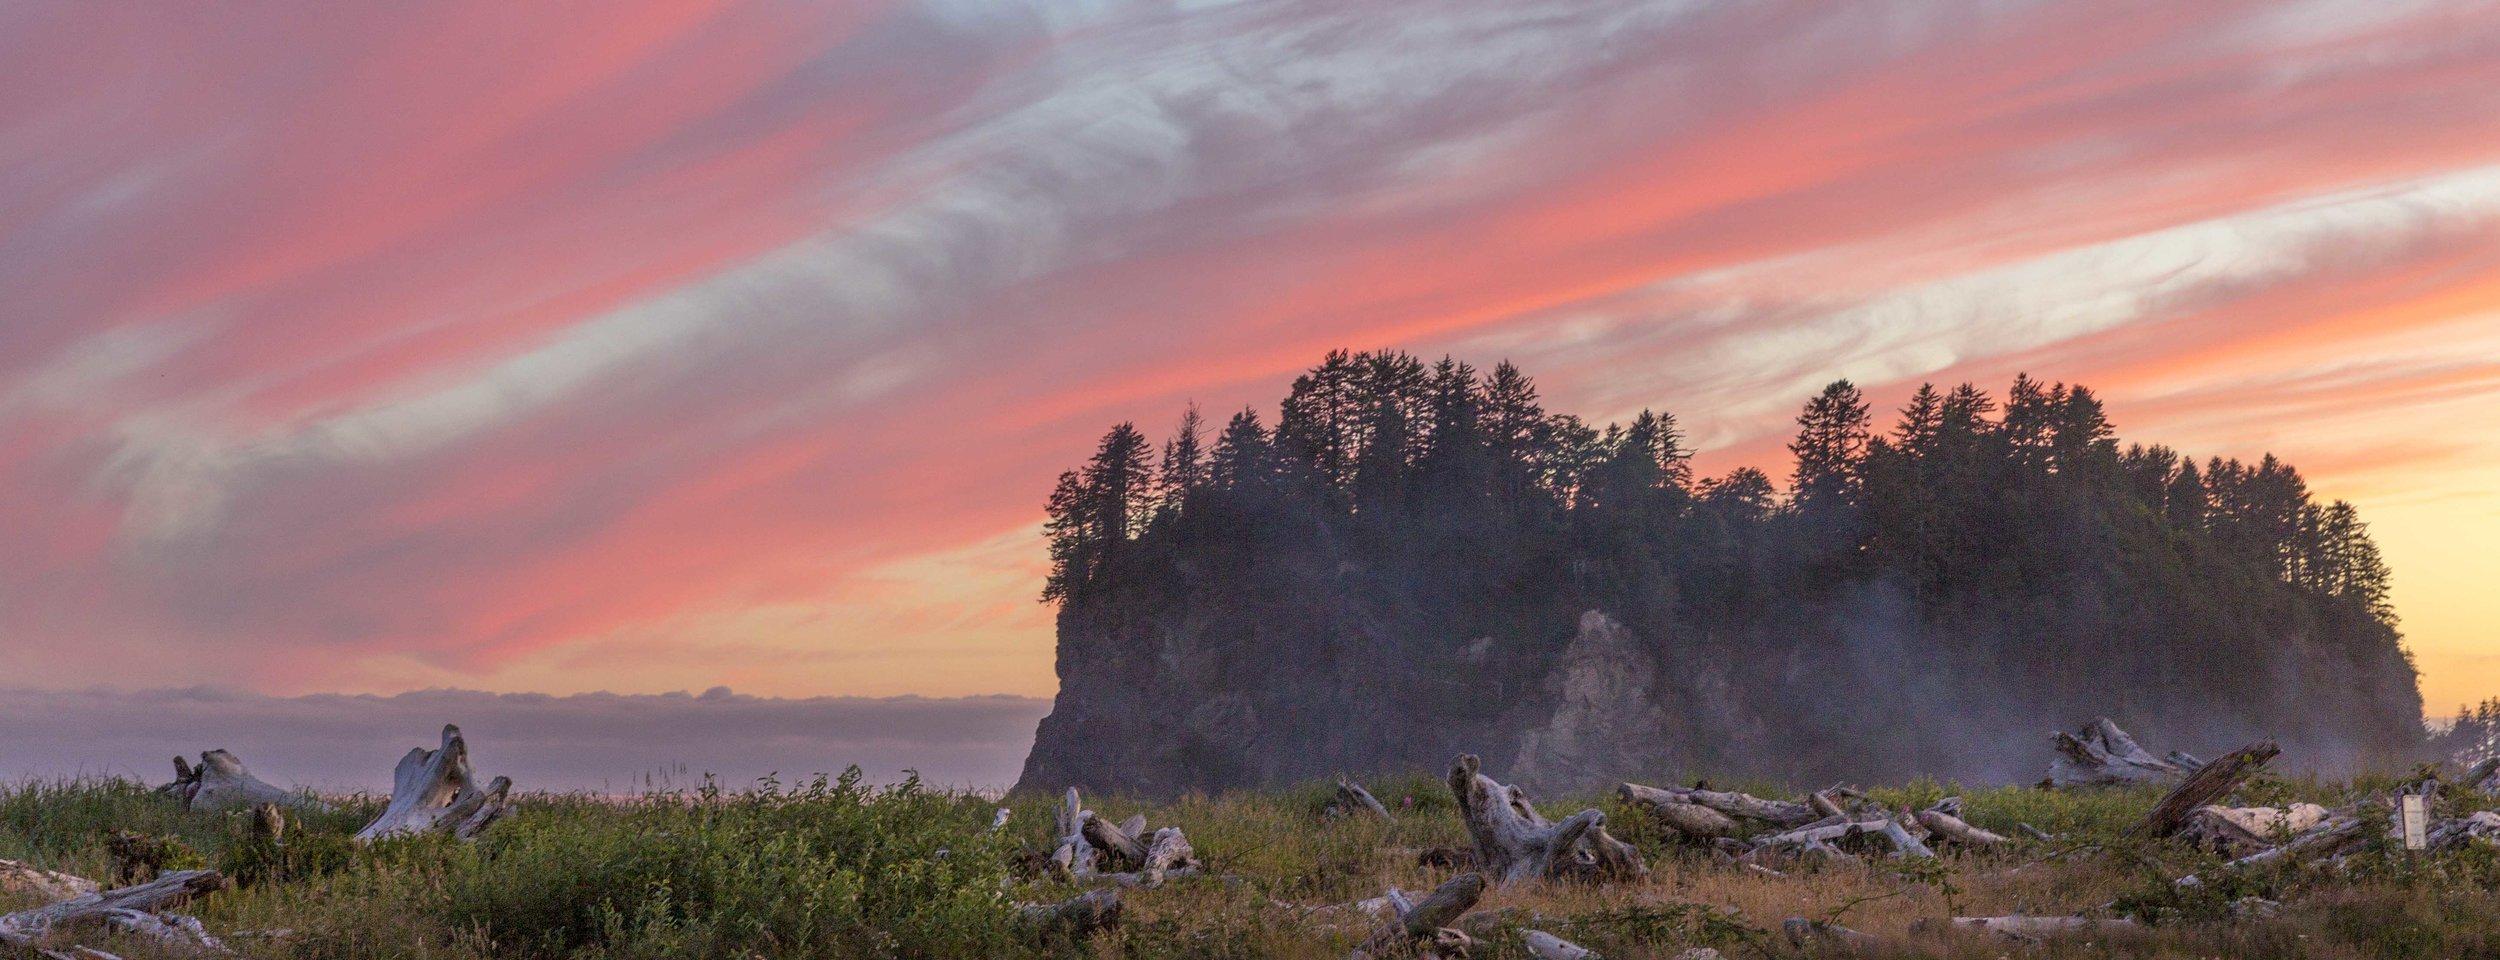 Olympic Peninsula - Washington USA